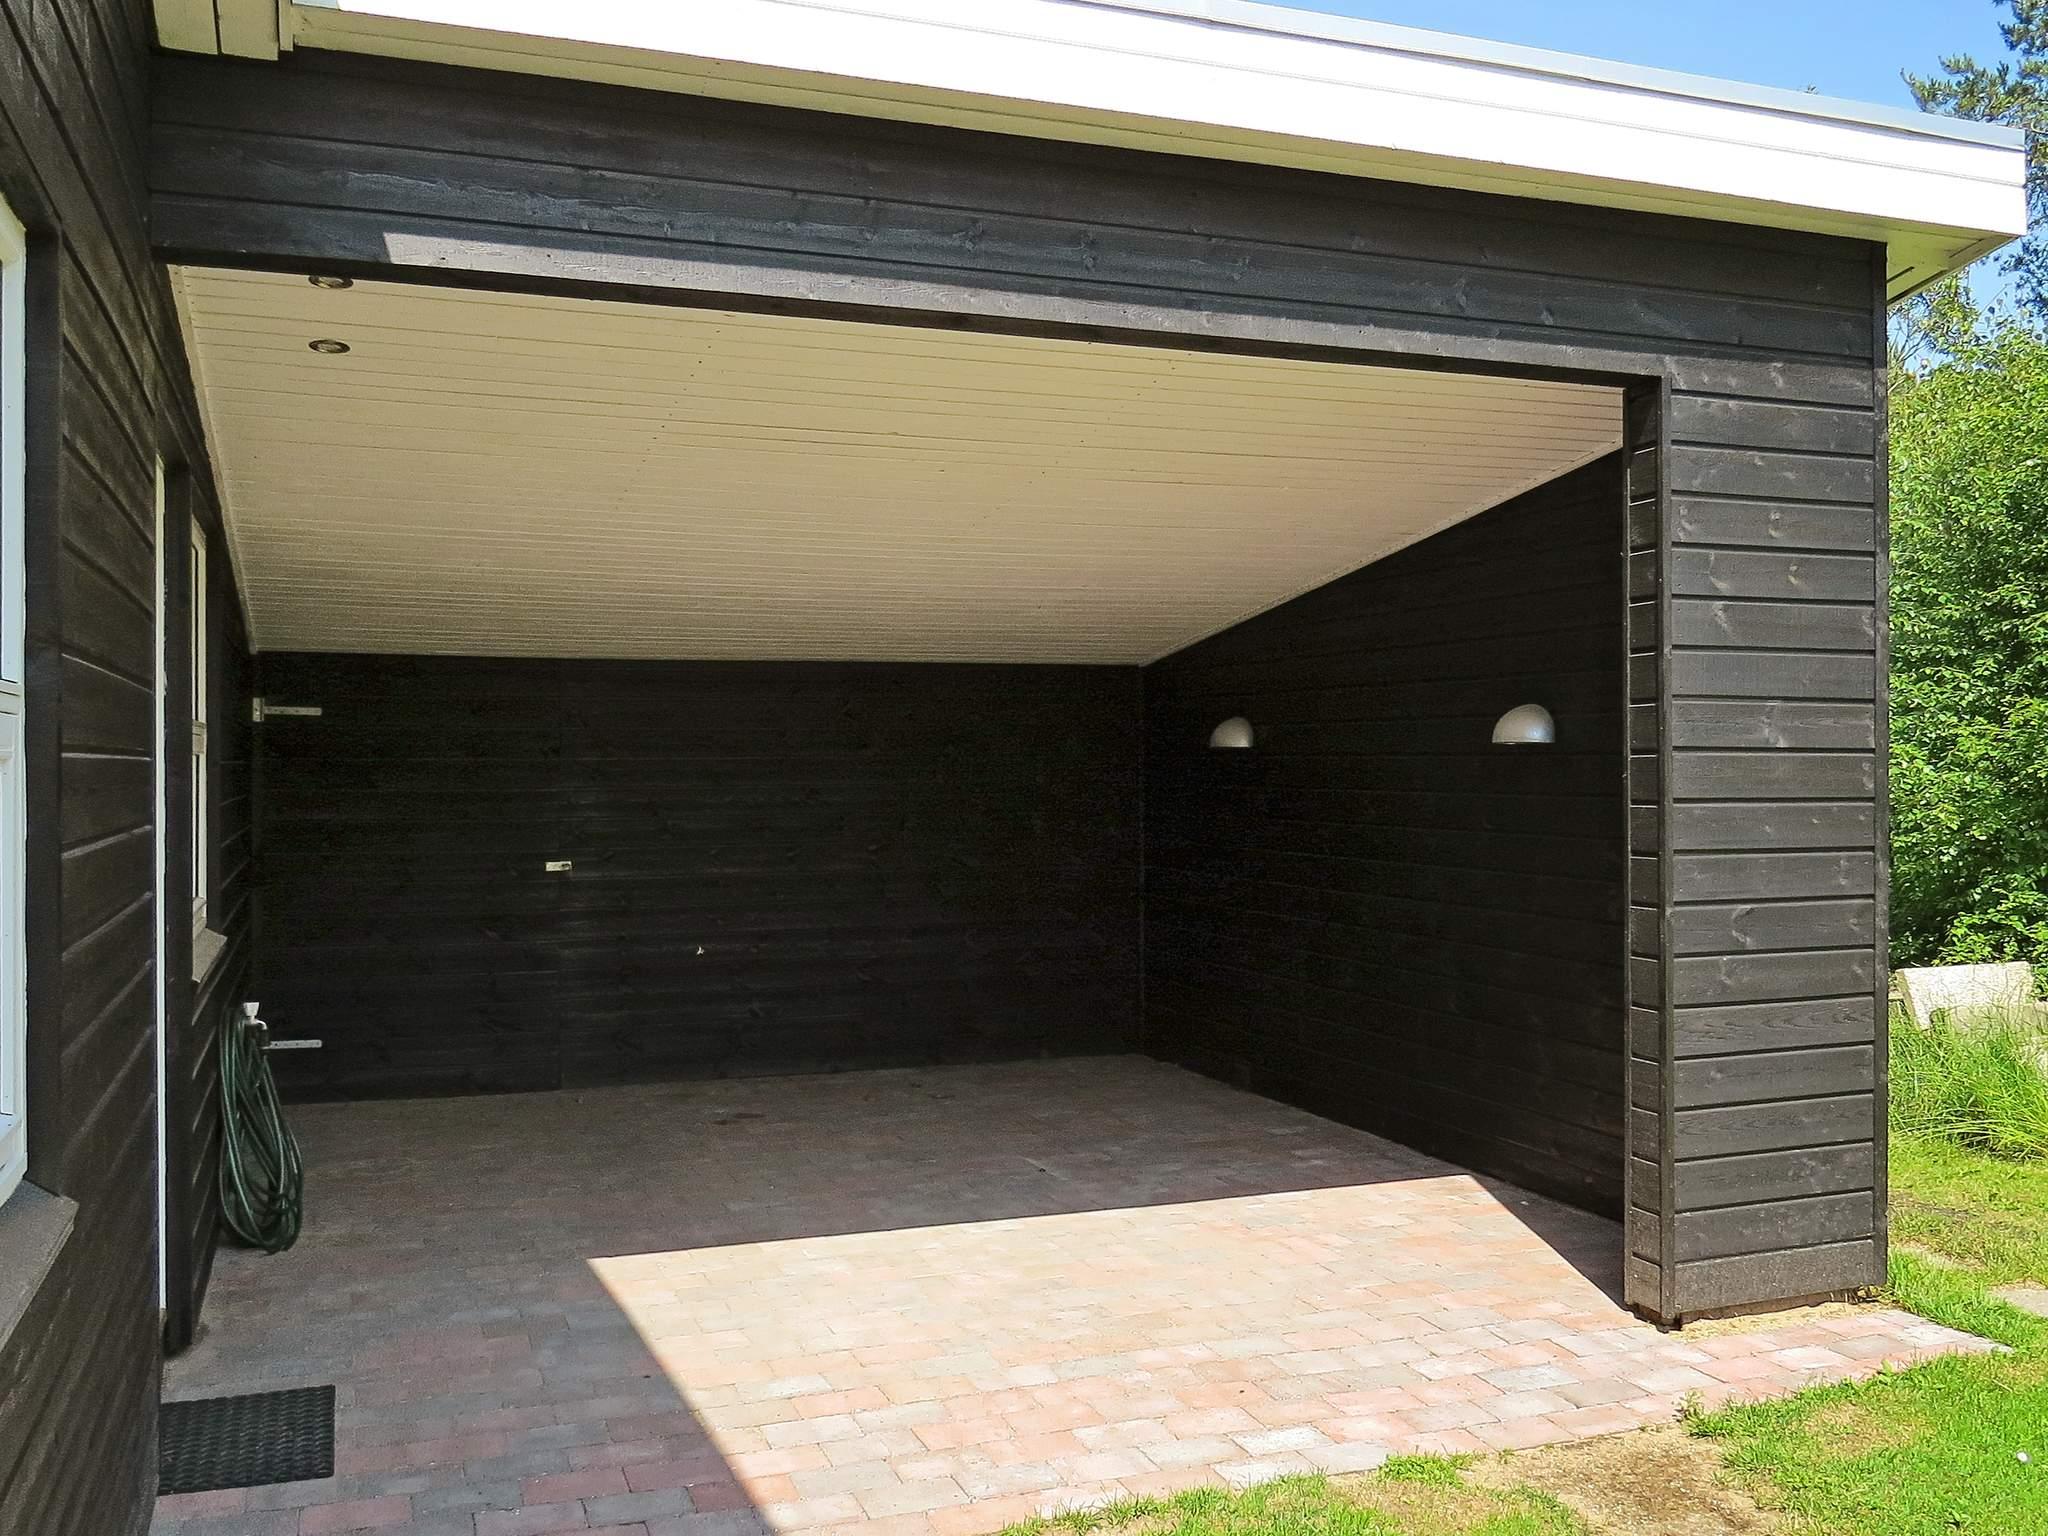 Ferienhaus Hou Nord/Melholt (83568), Hou, , Nordostjütland, Dänemark, Bild 24